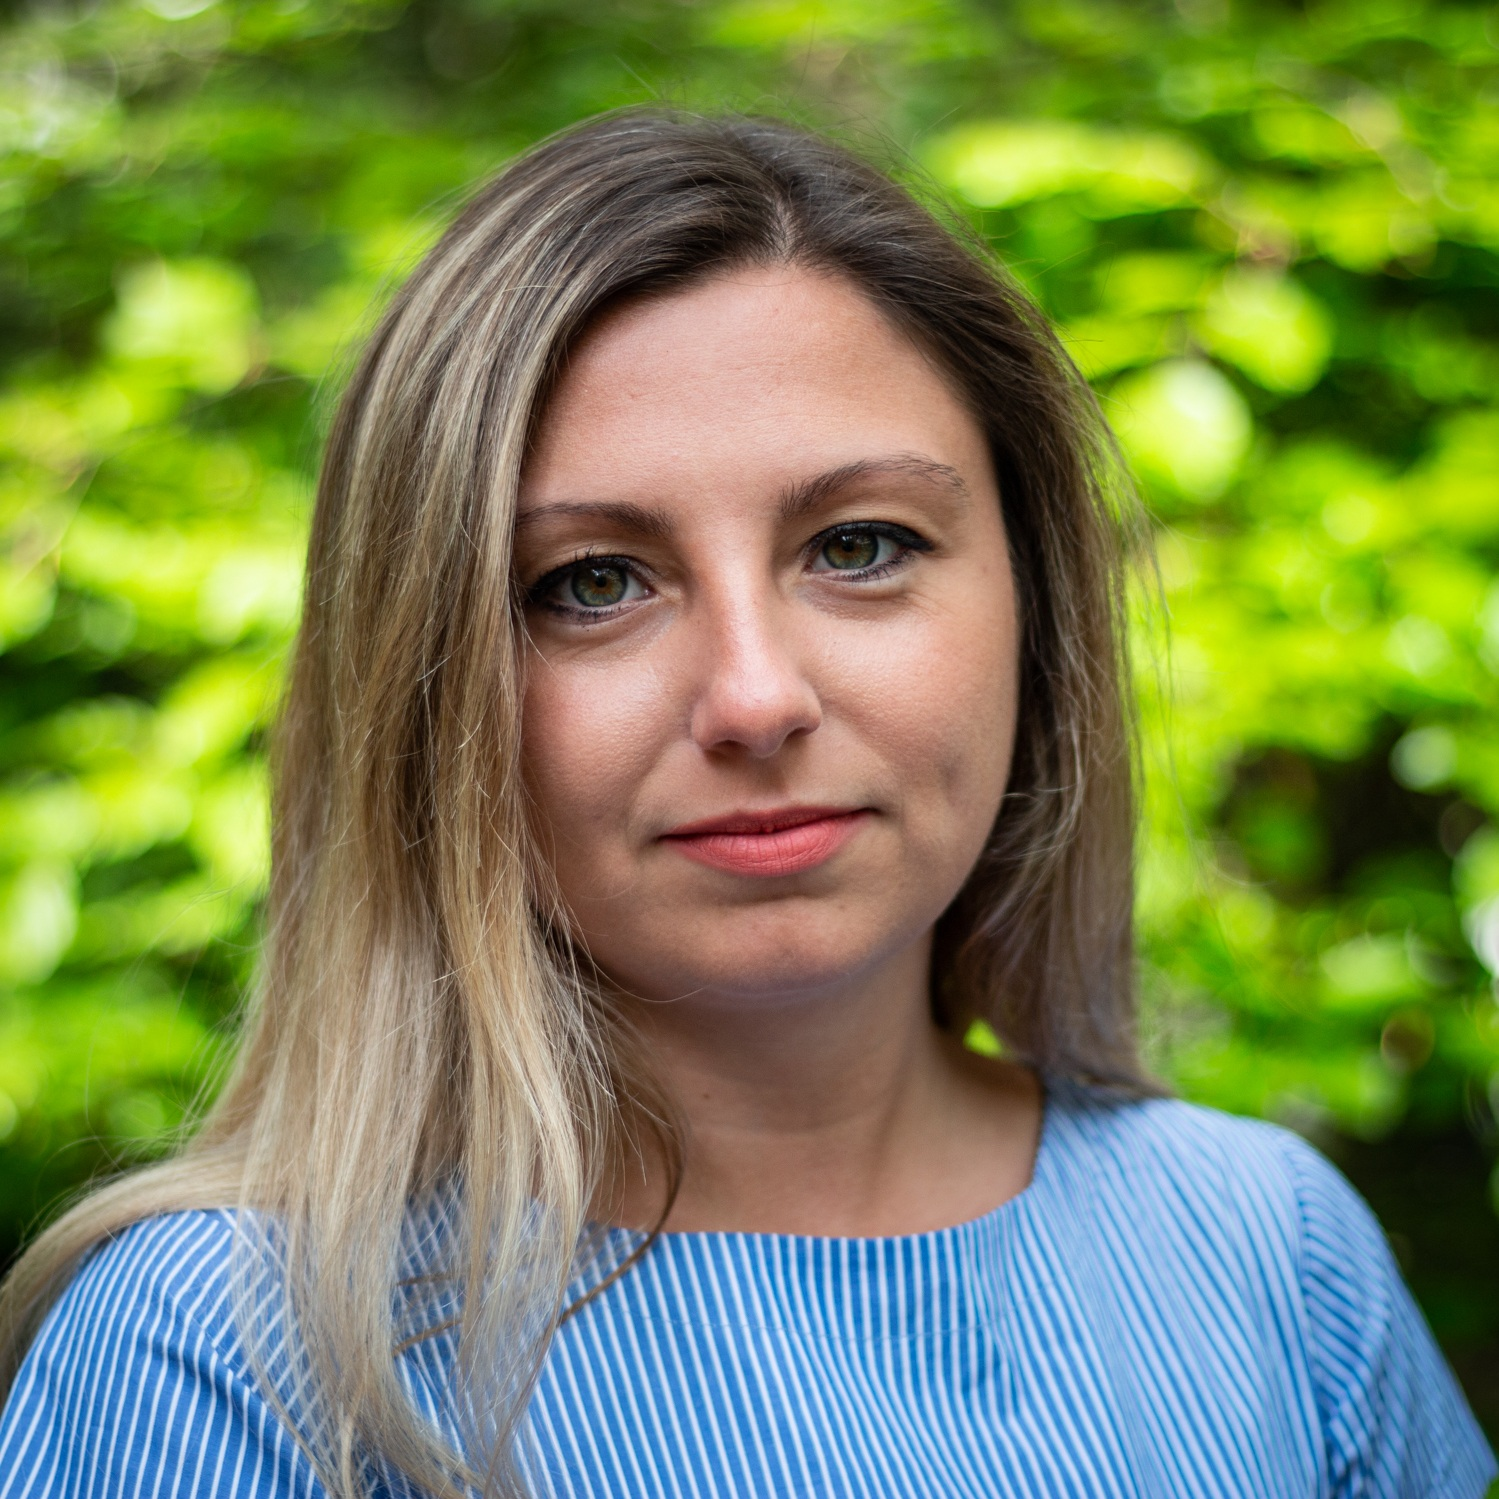 Melissa Novotny - Business & Partnership Development Manager